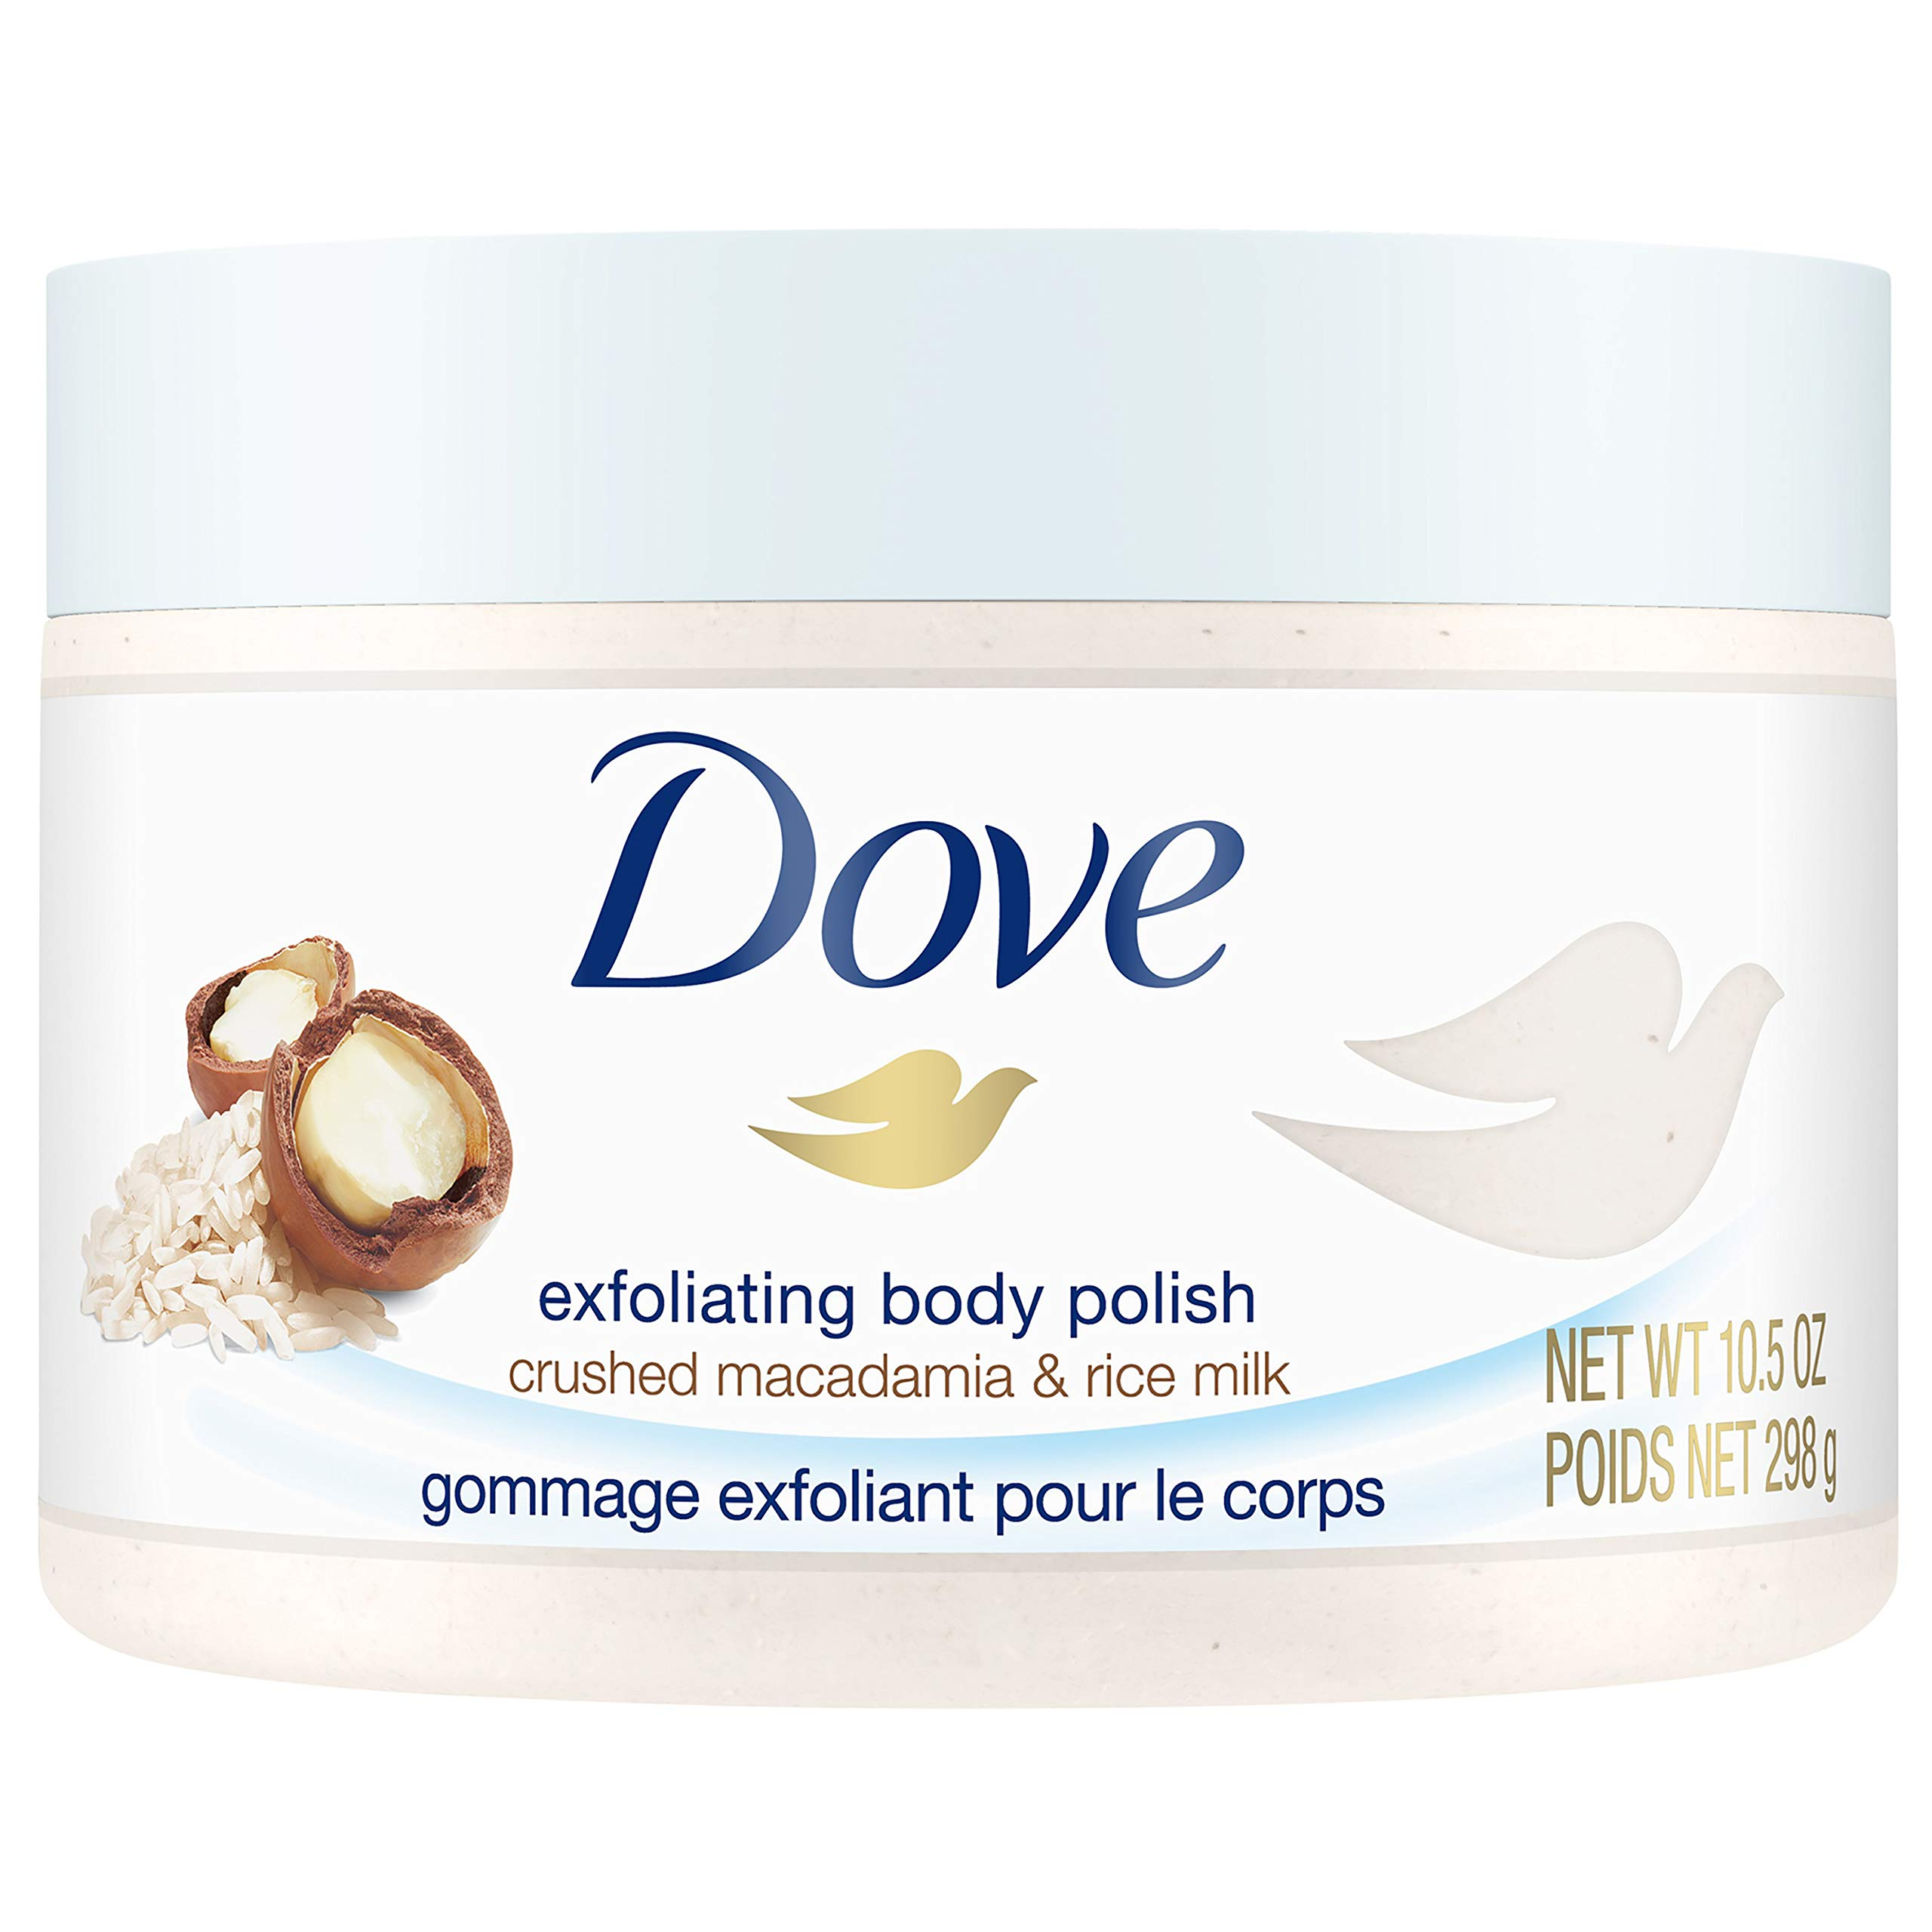 Dove - Dove Exfoliating Body Polish Body Scrub, Macadamia & Rice Milk, 10.5 oz